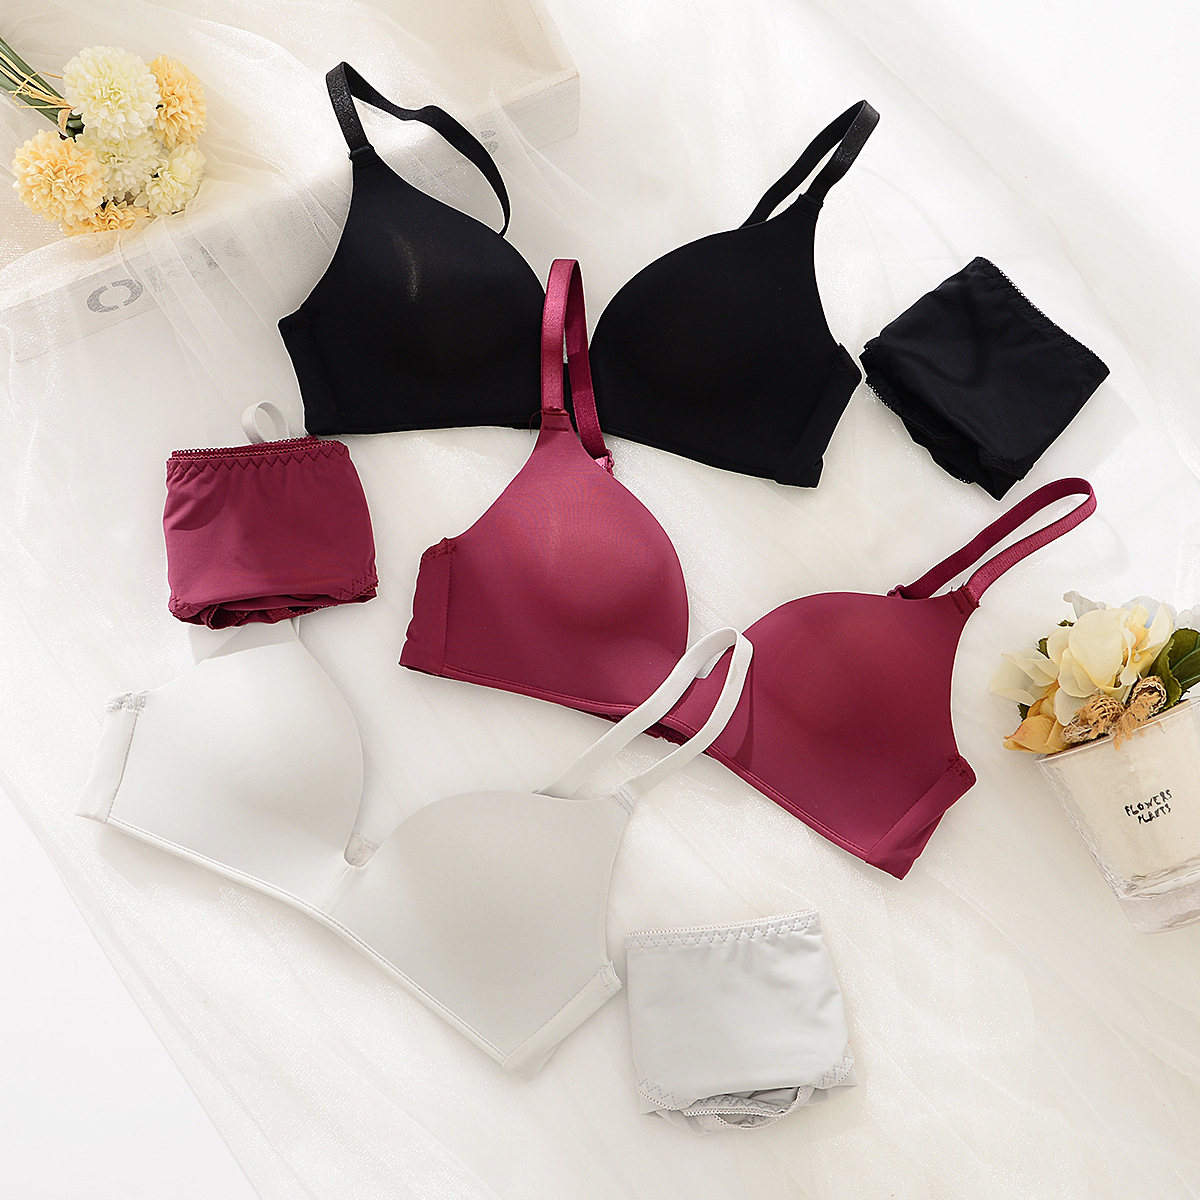 2019 High-end Brand Romantic Temptation   Bra     Set   Women Fashion Stripes Underwear   Set   Push Up Seamless Lade   Bra   and Panties   Set